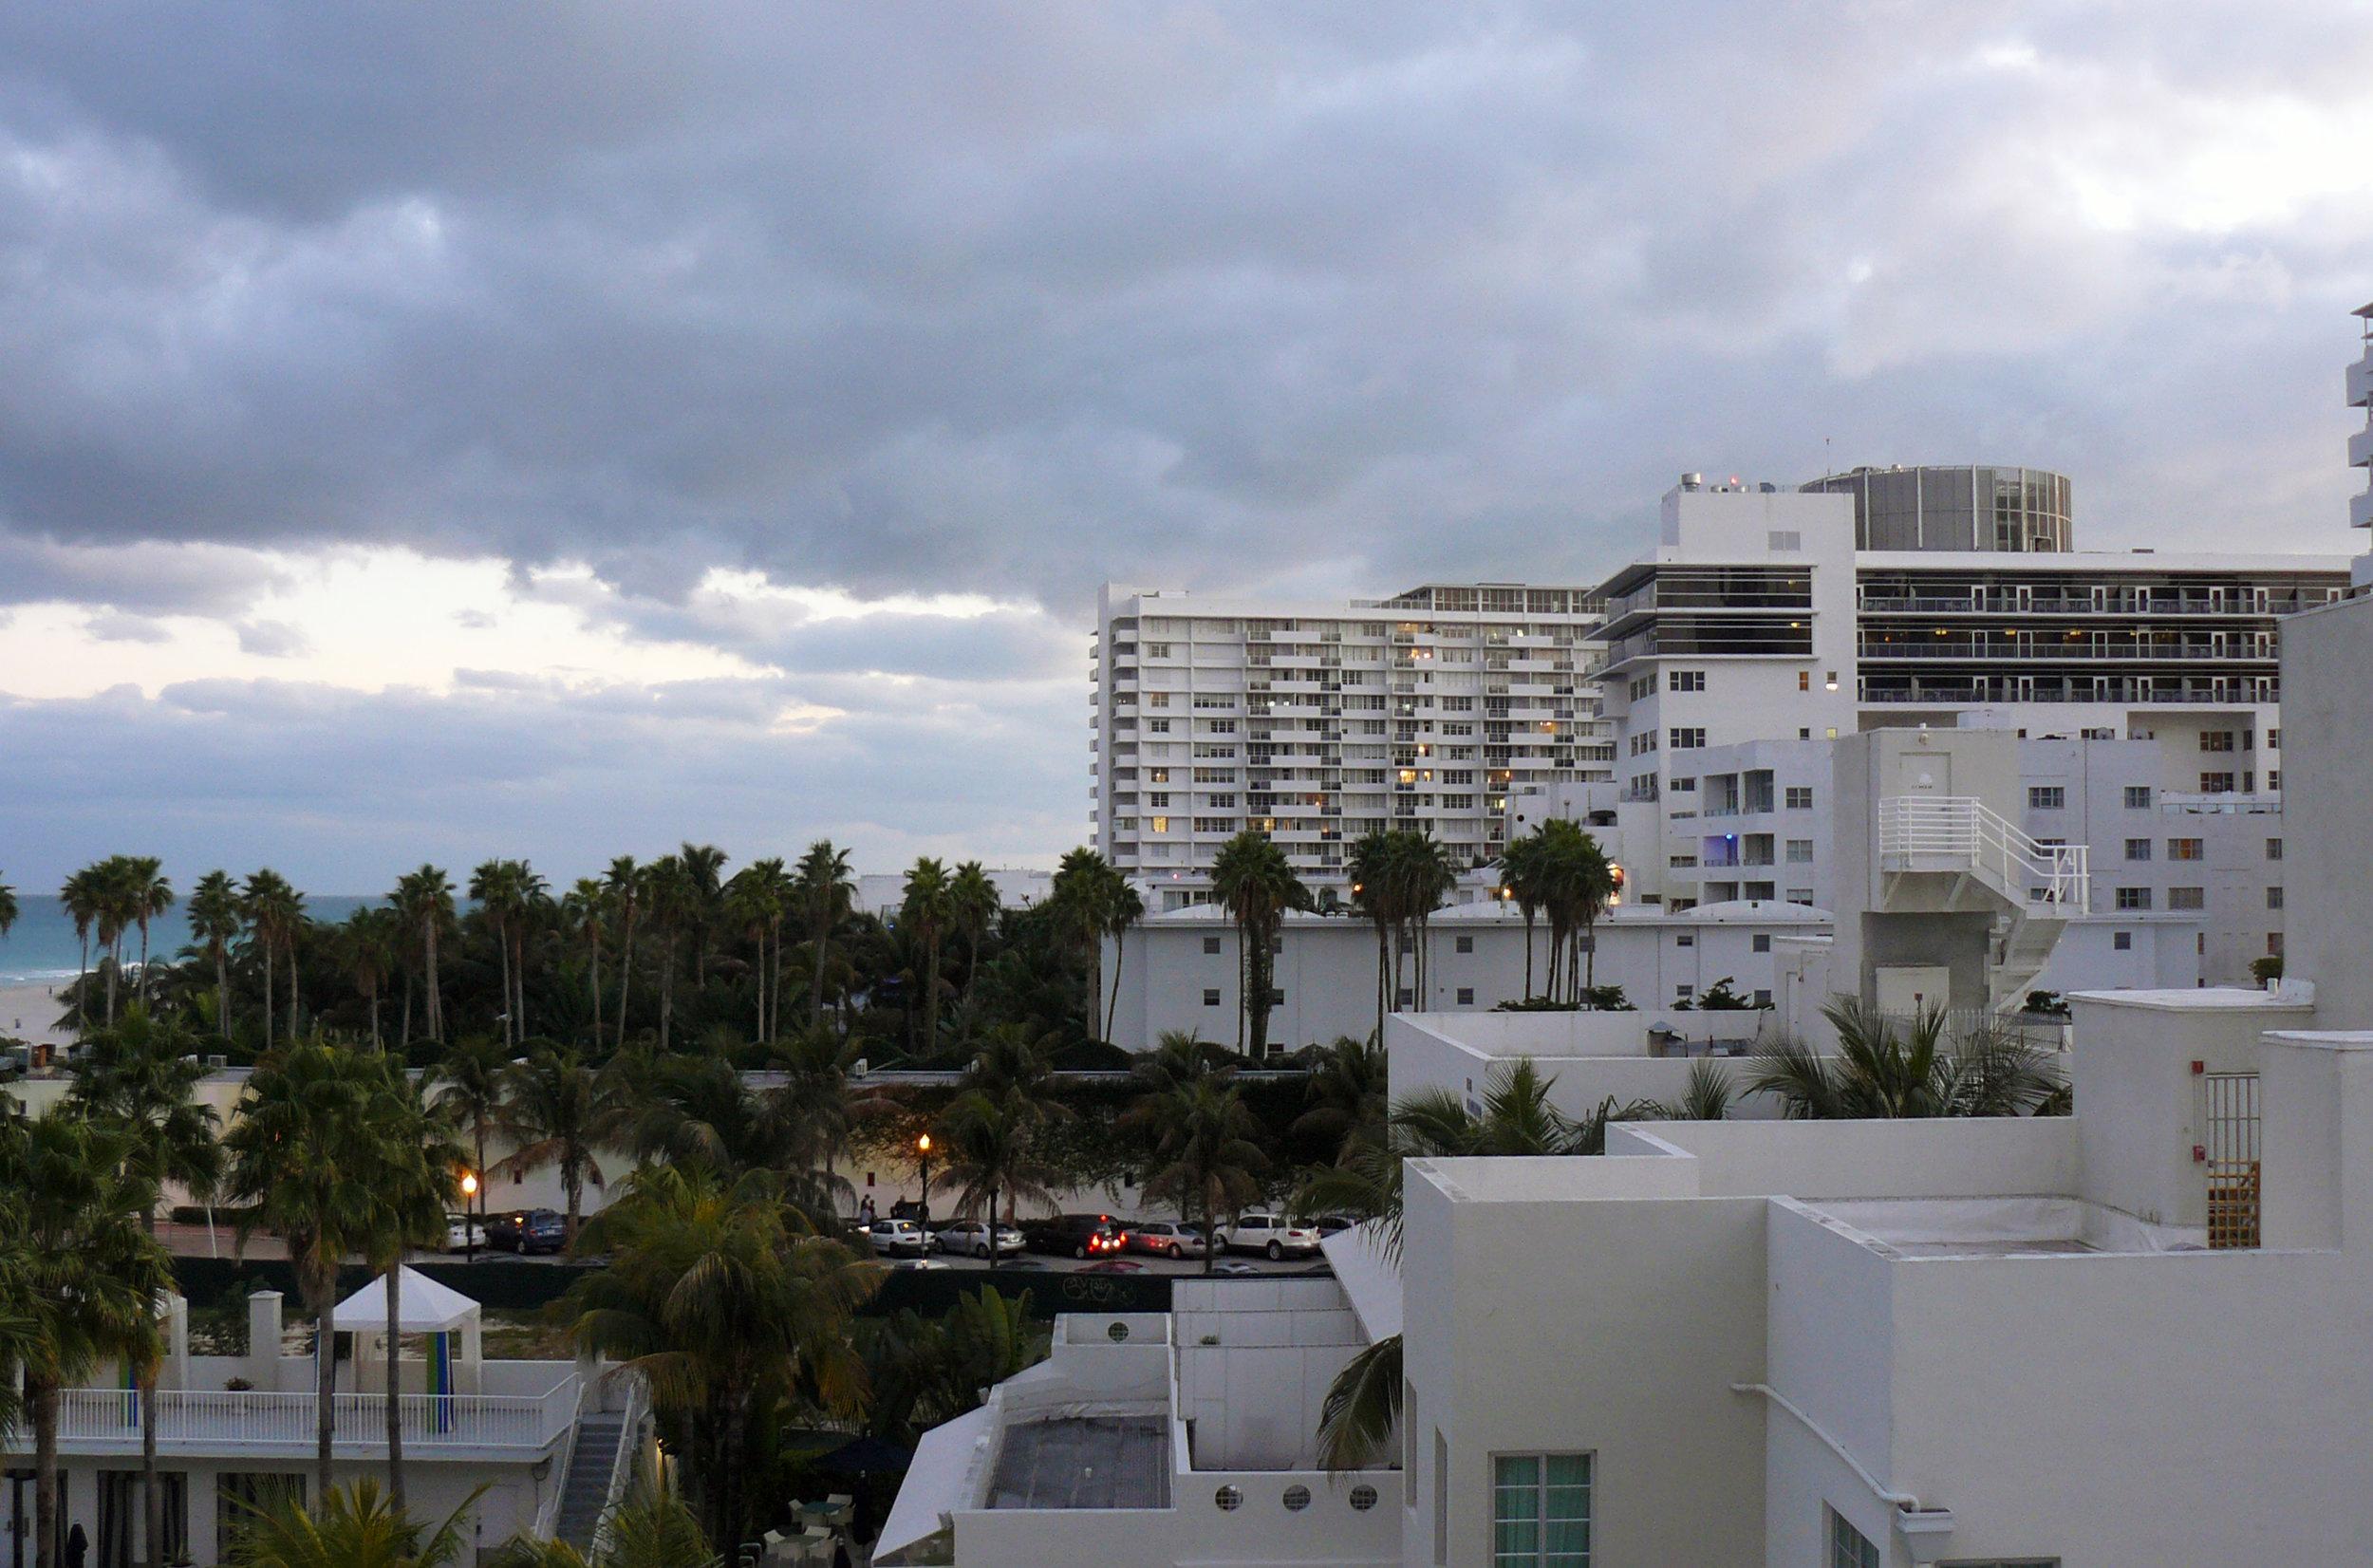 Southseas Hotel, Miami, FL, Room 534, $322